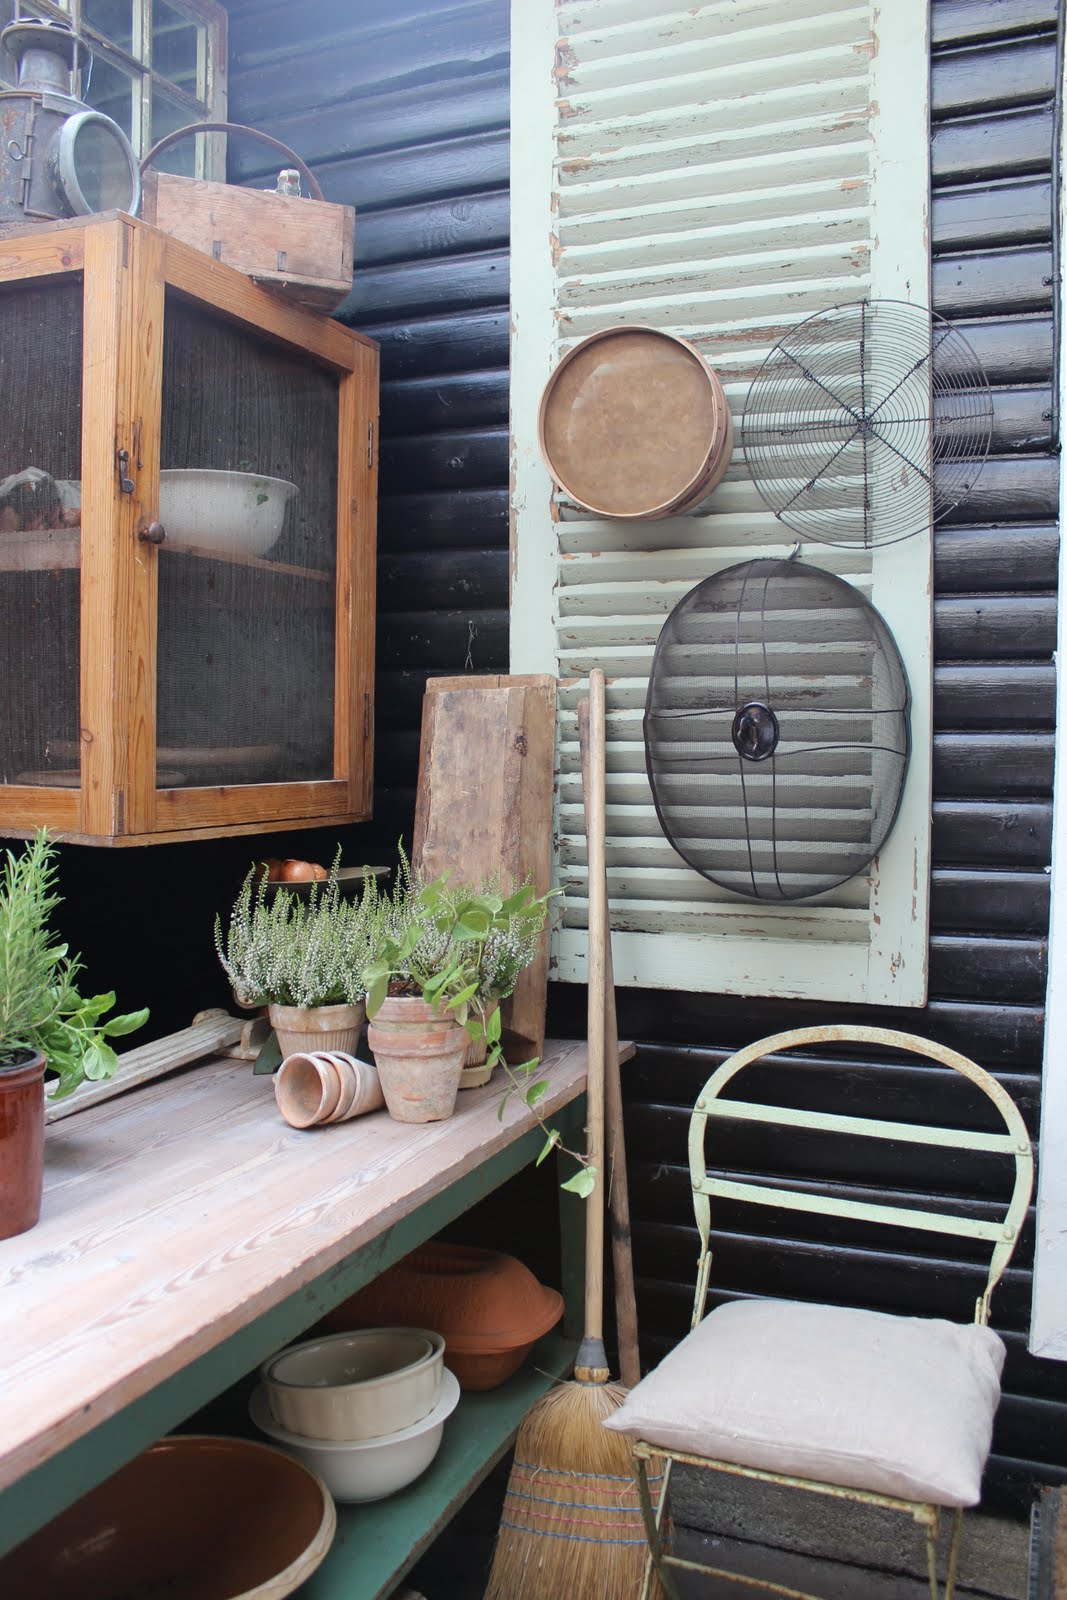 K&Co. Antiques´s blog.: Gamle skodder og havelåger...